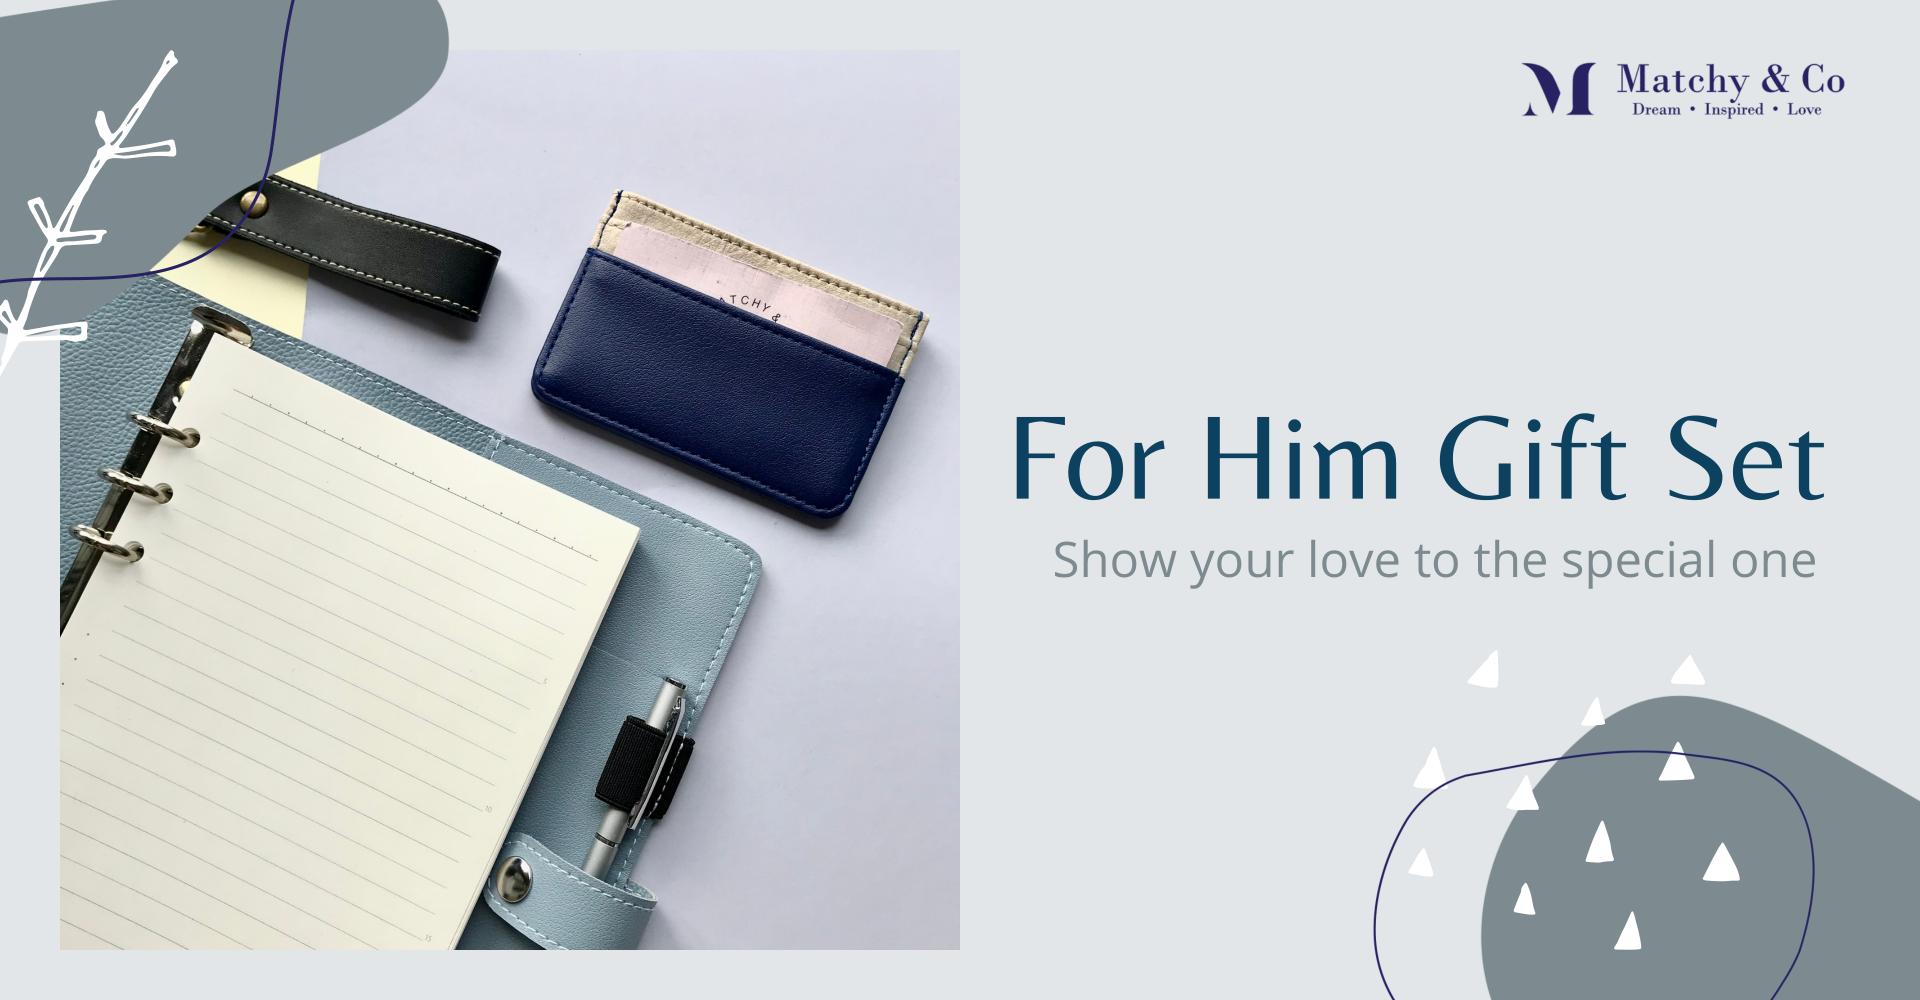 For Him Gift Set